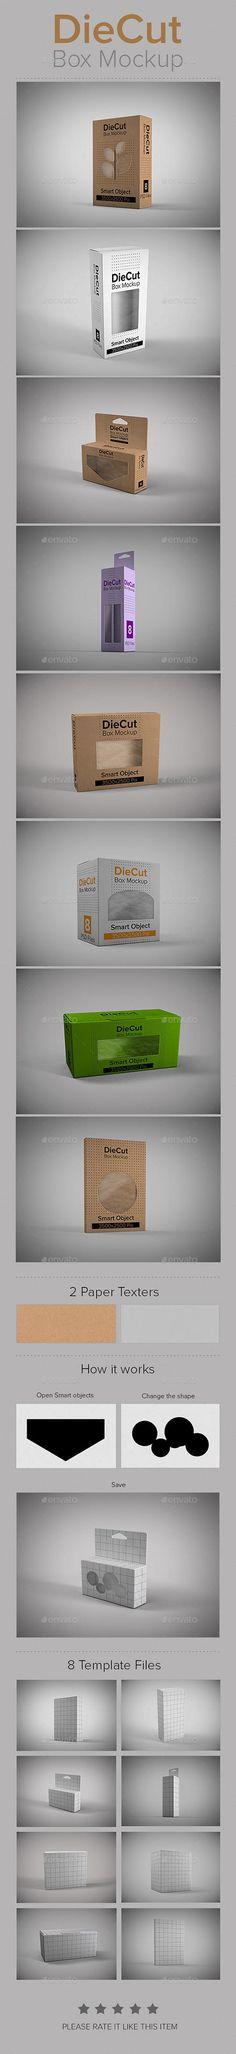 Download 30 Mockup Ideas Mockup Mockup Design Photoshop Mockup